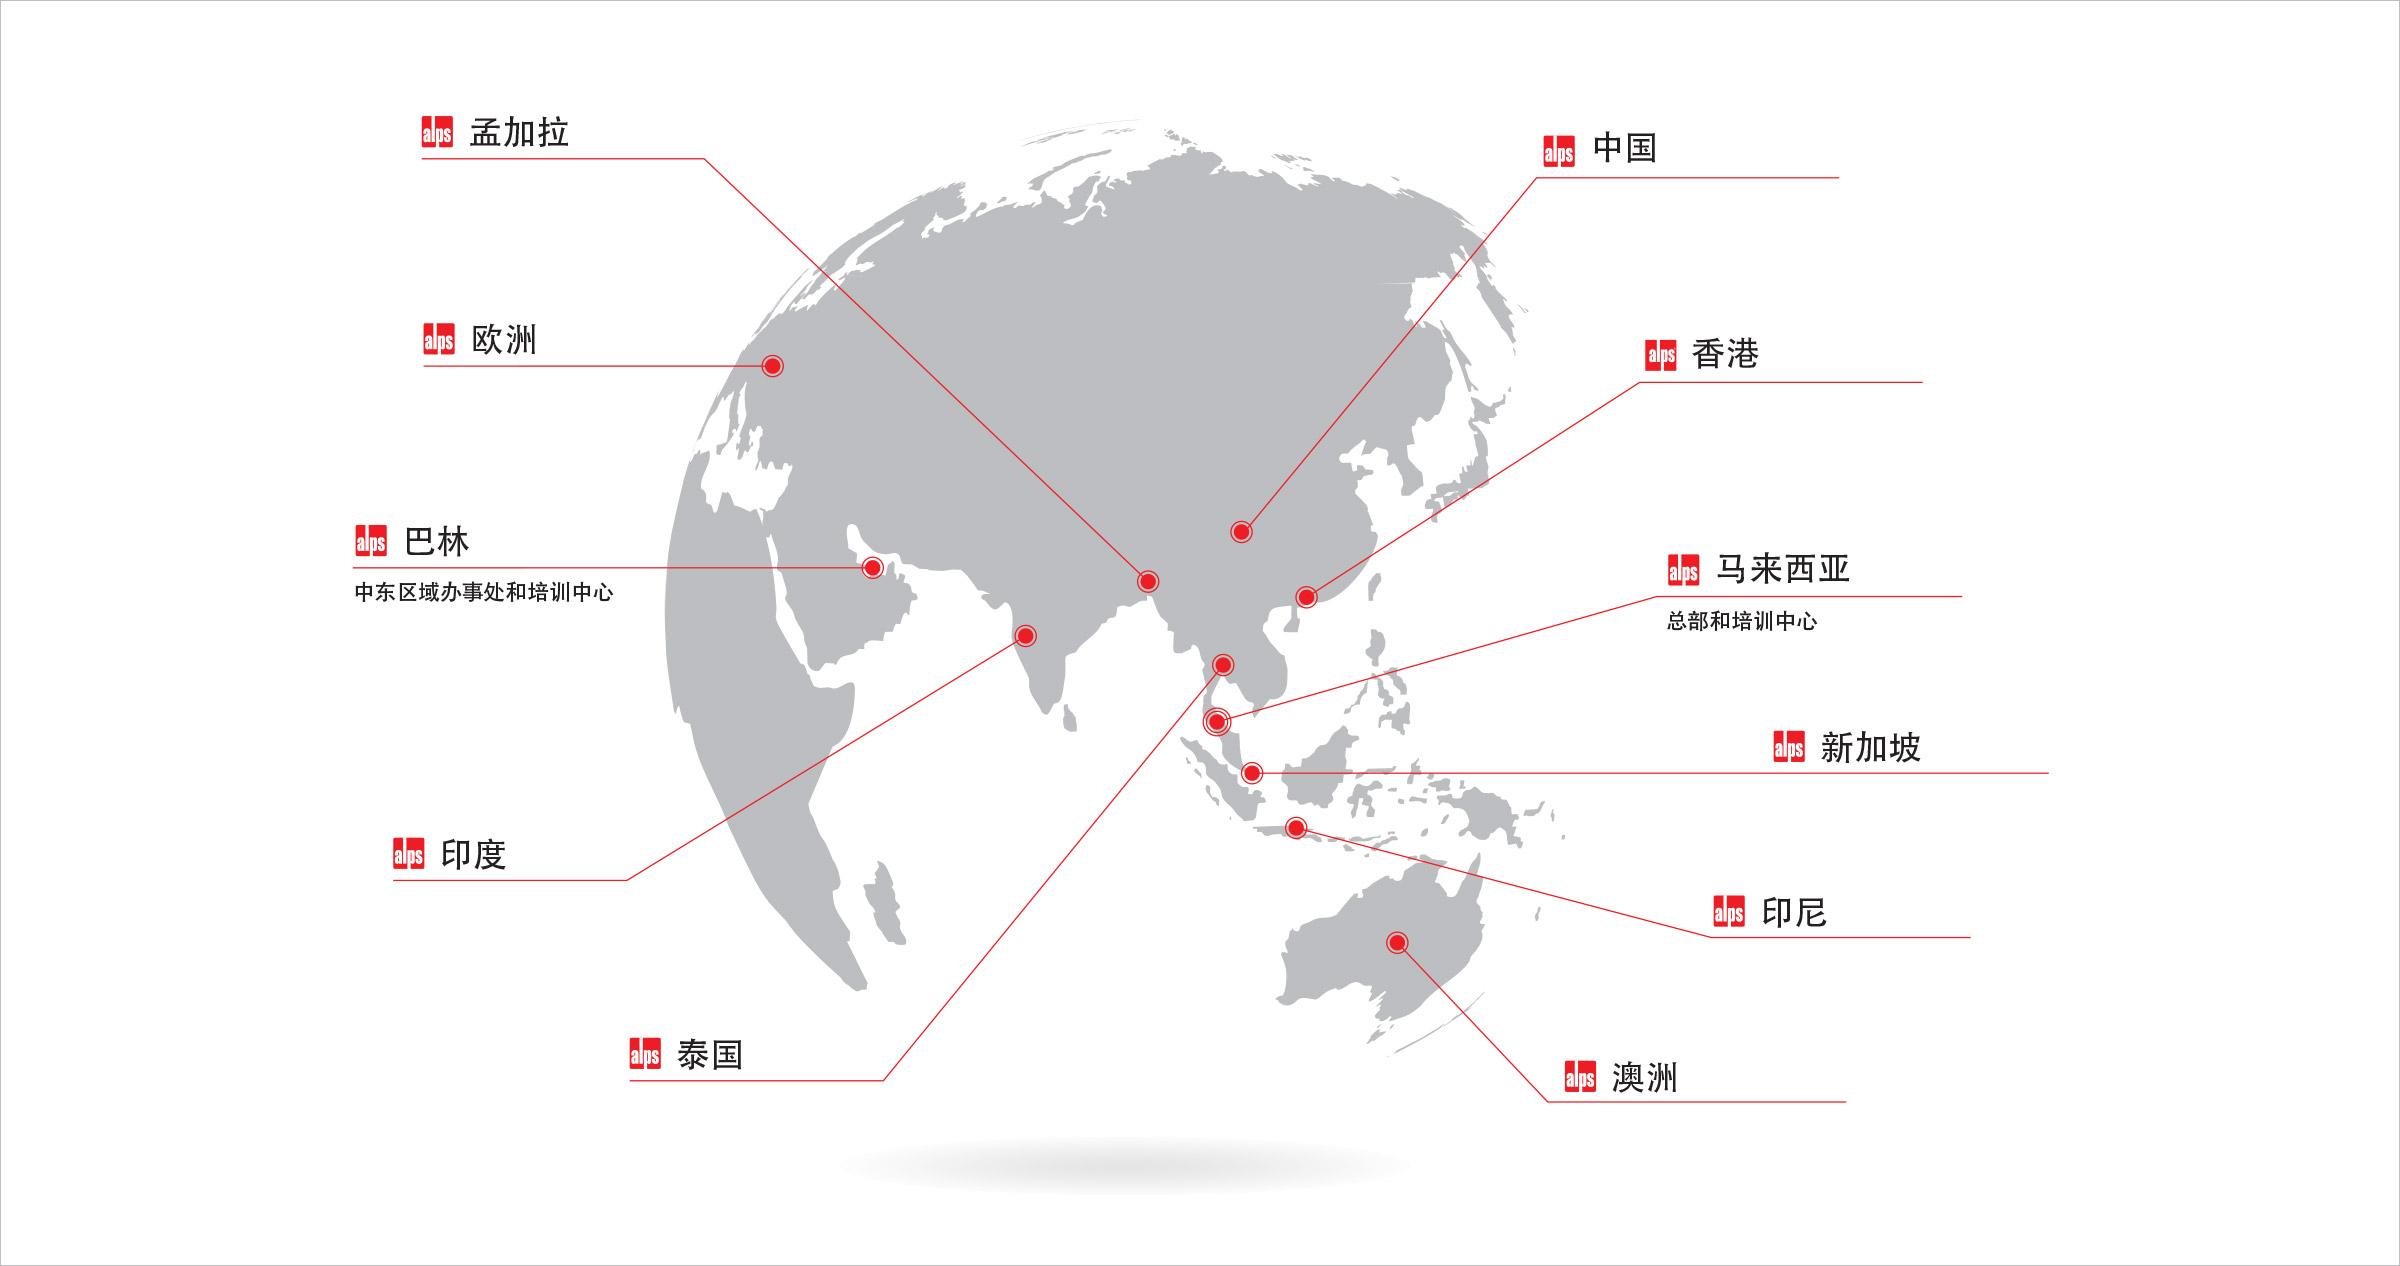 alpscoating-network-zh